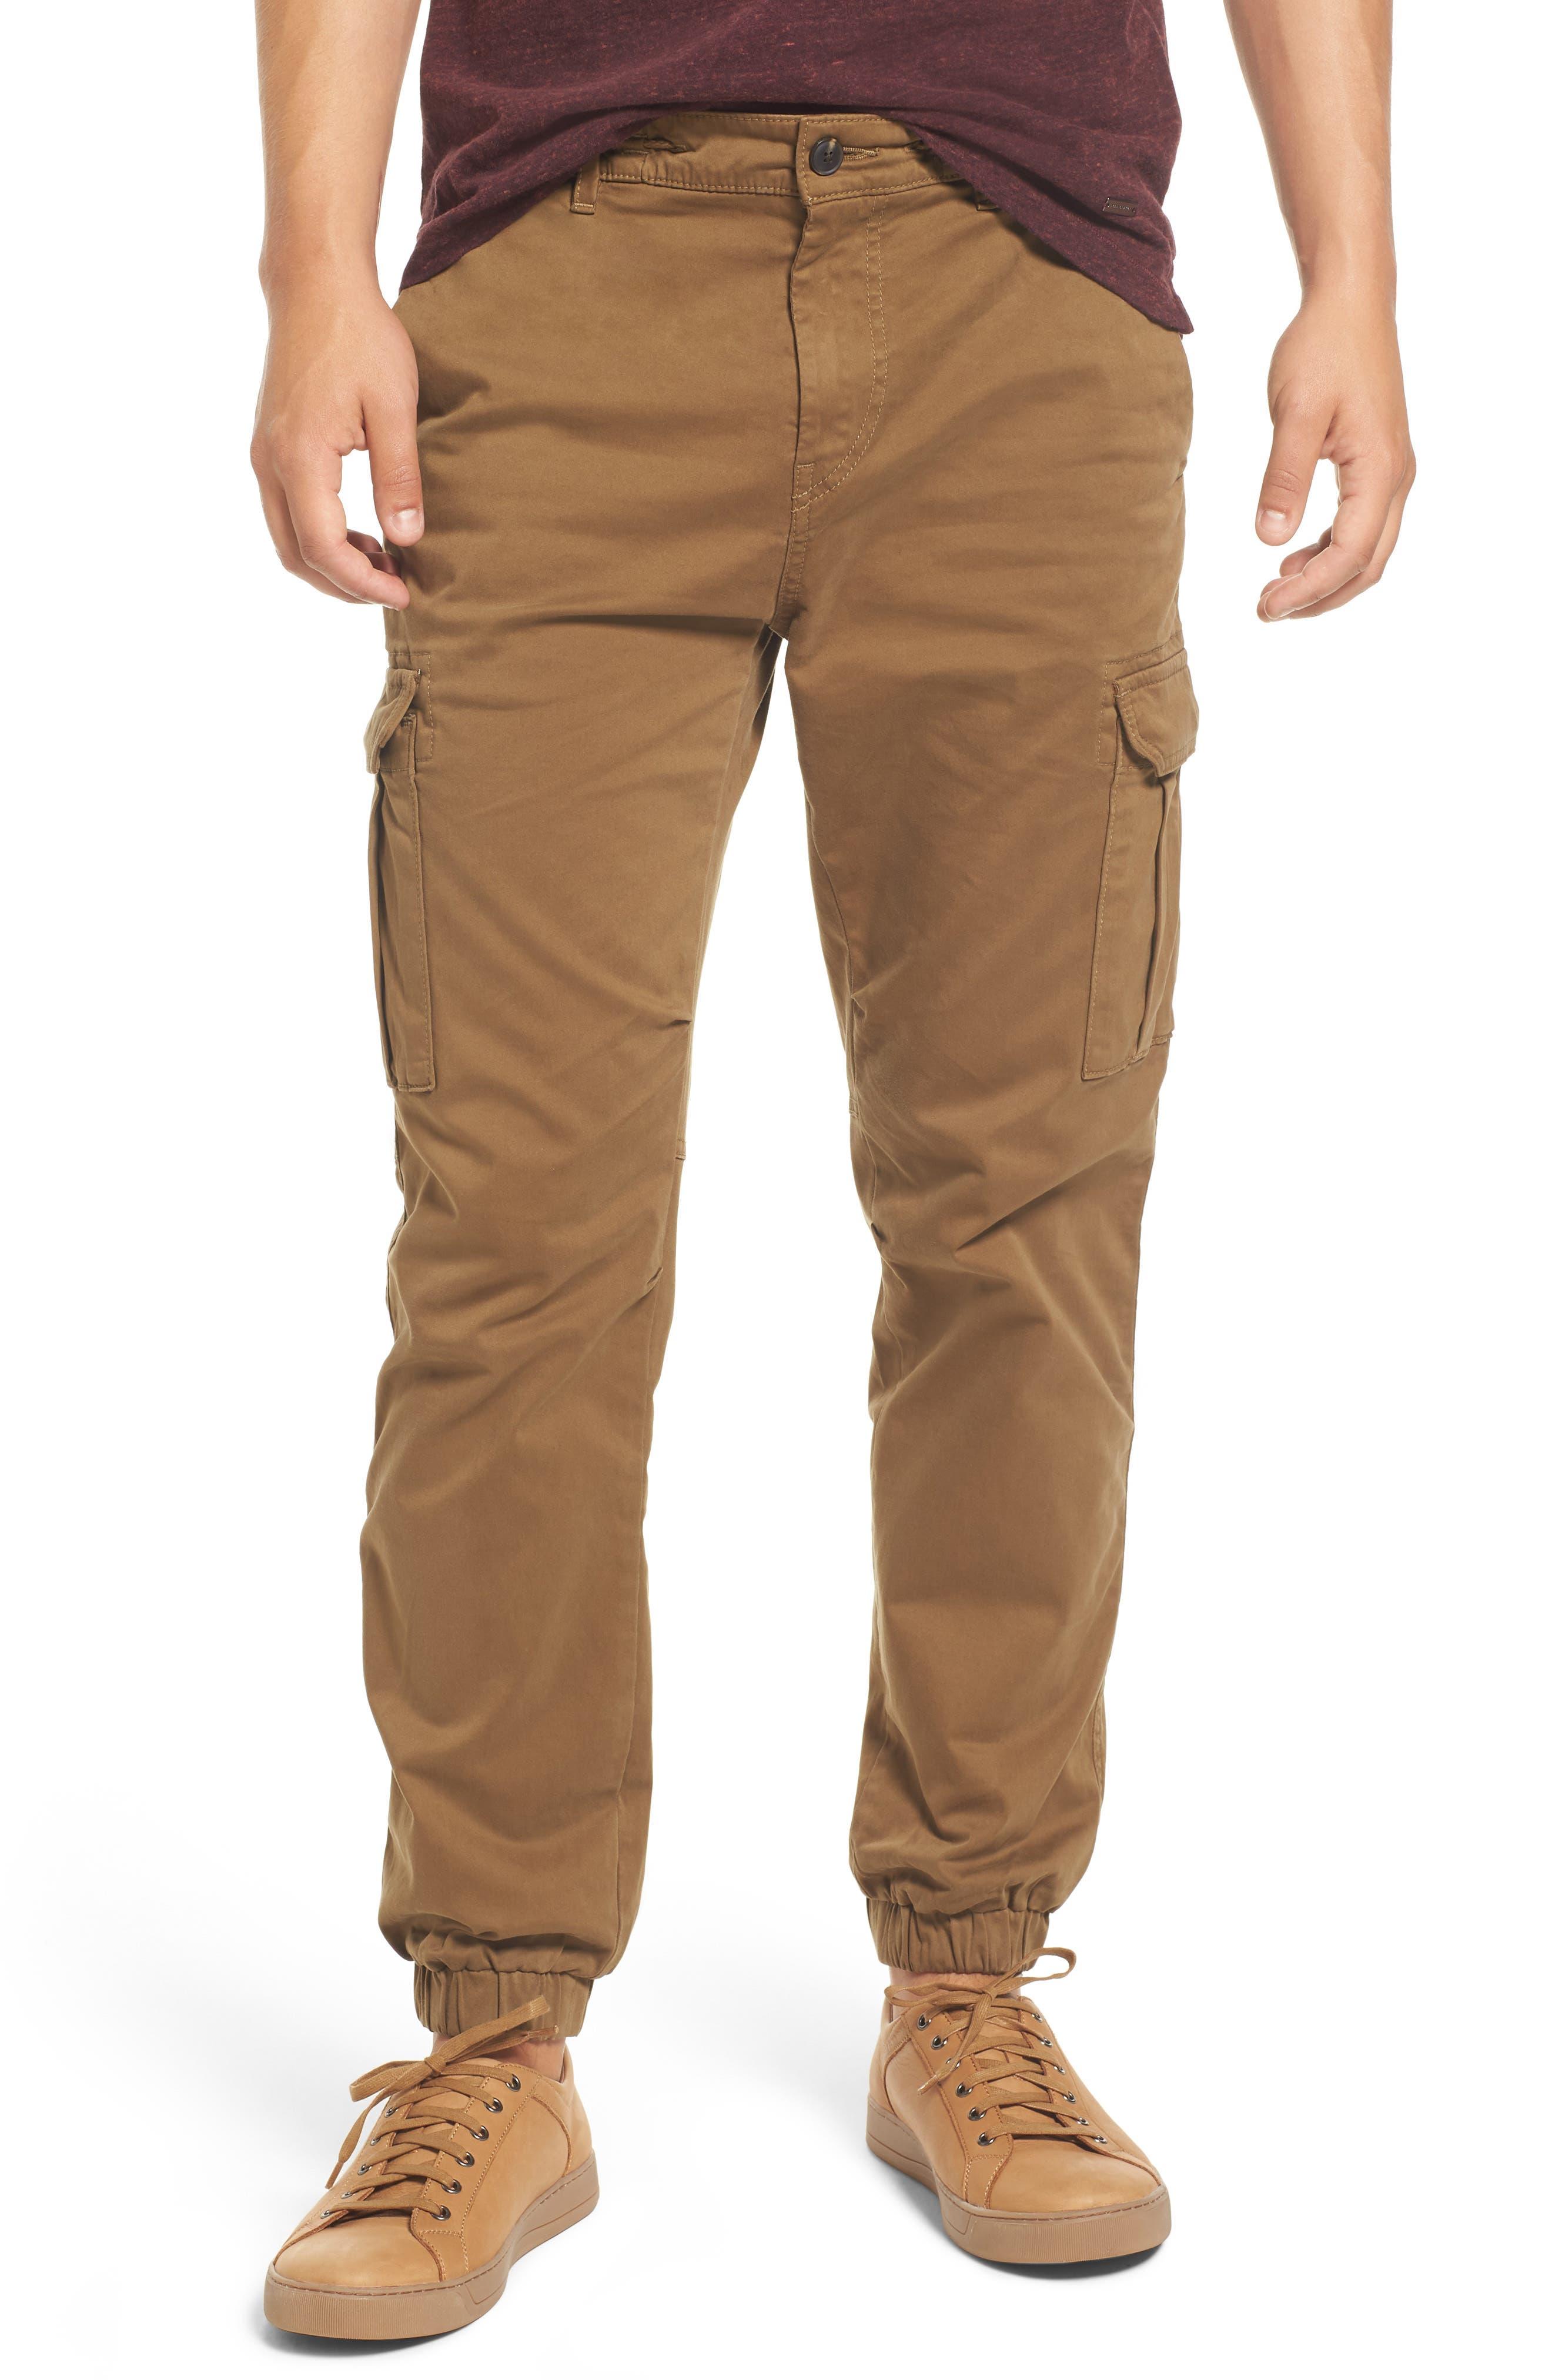 Shay 2 Cargo Pants,                         Main,                         color, Open Beige